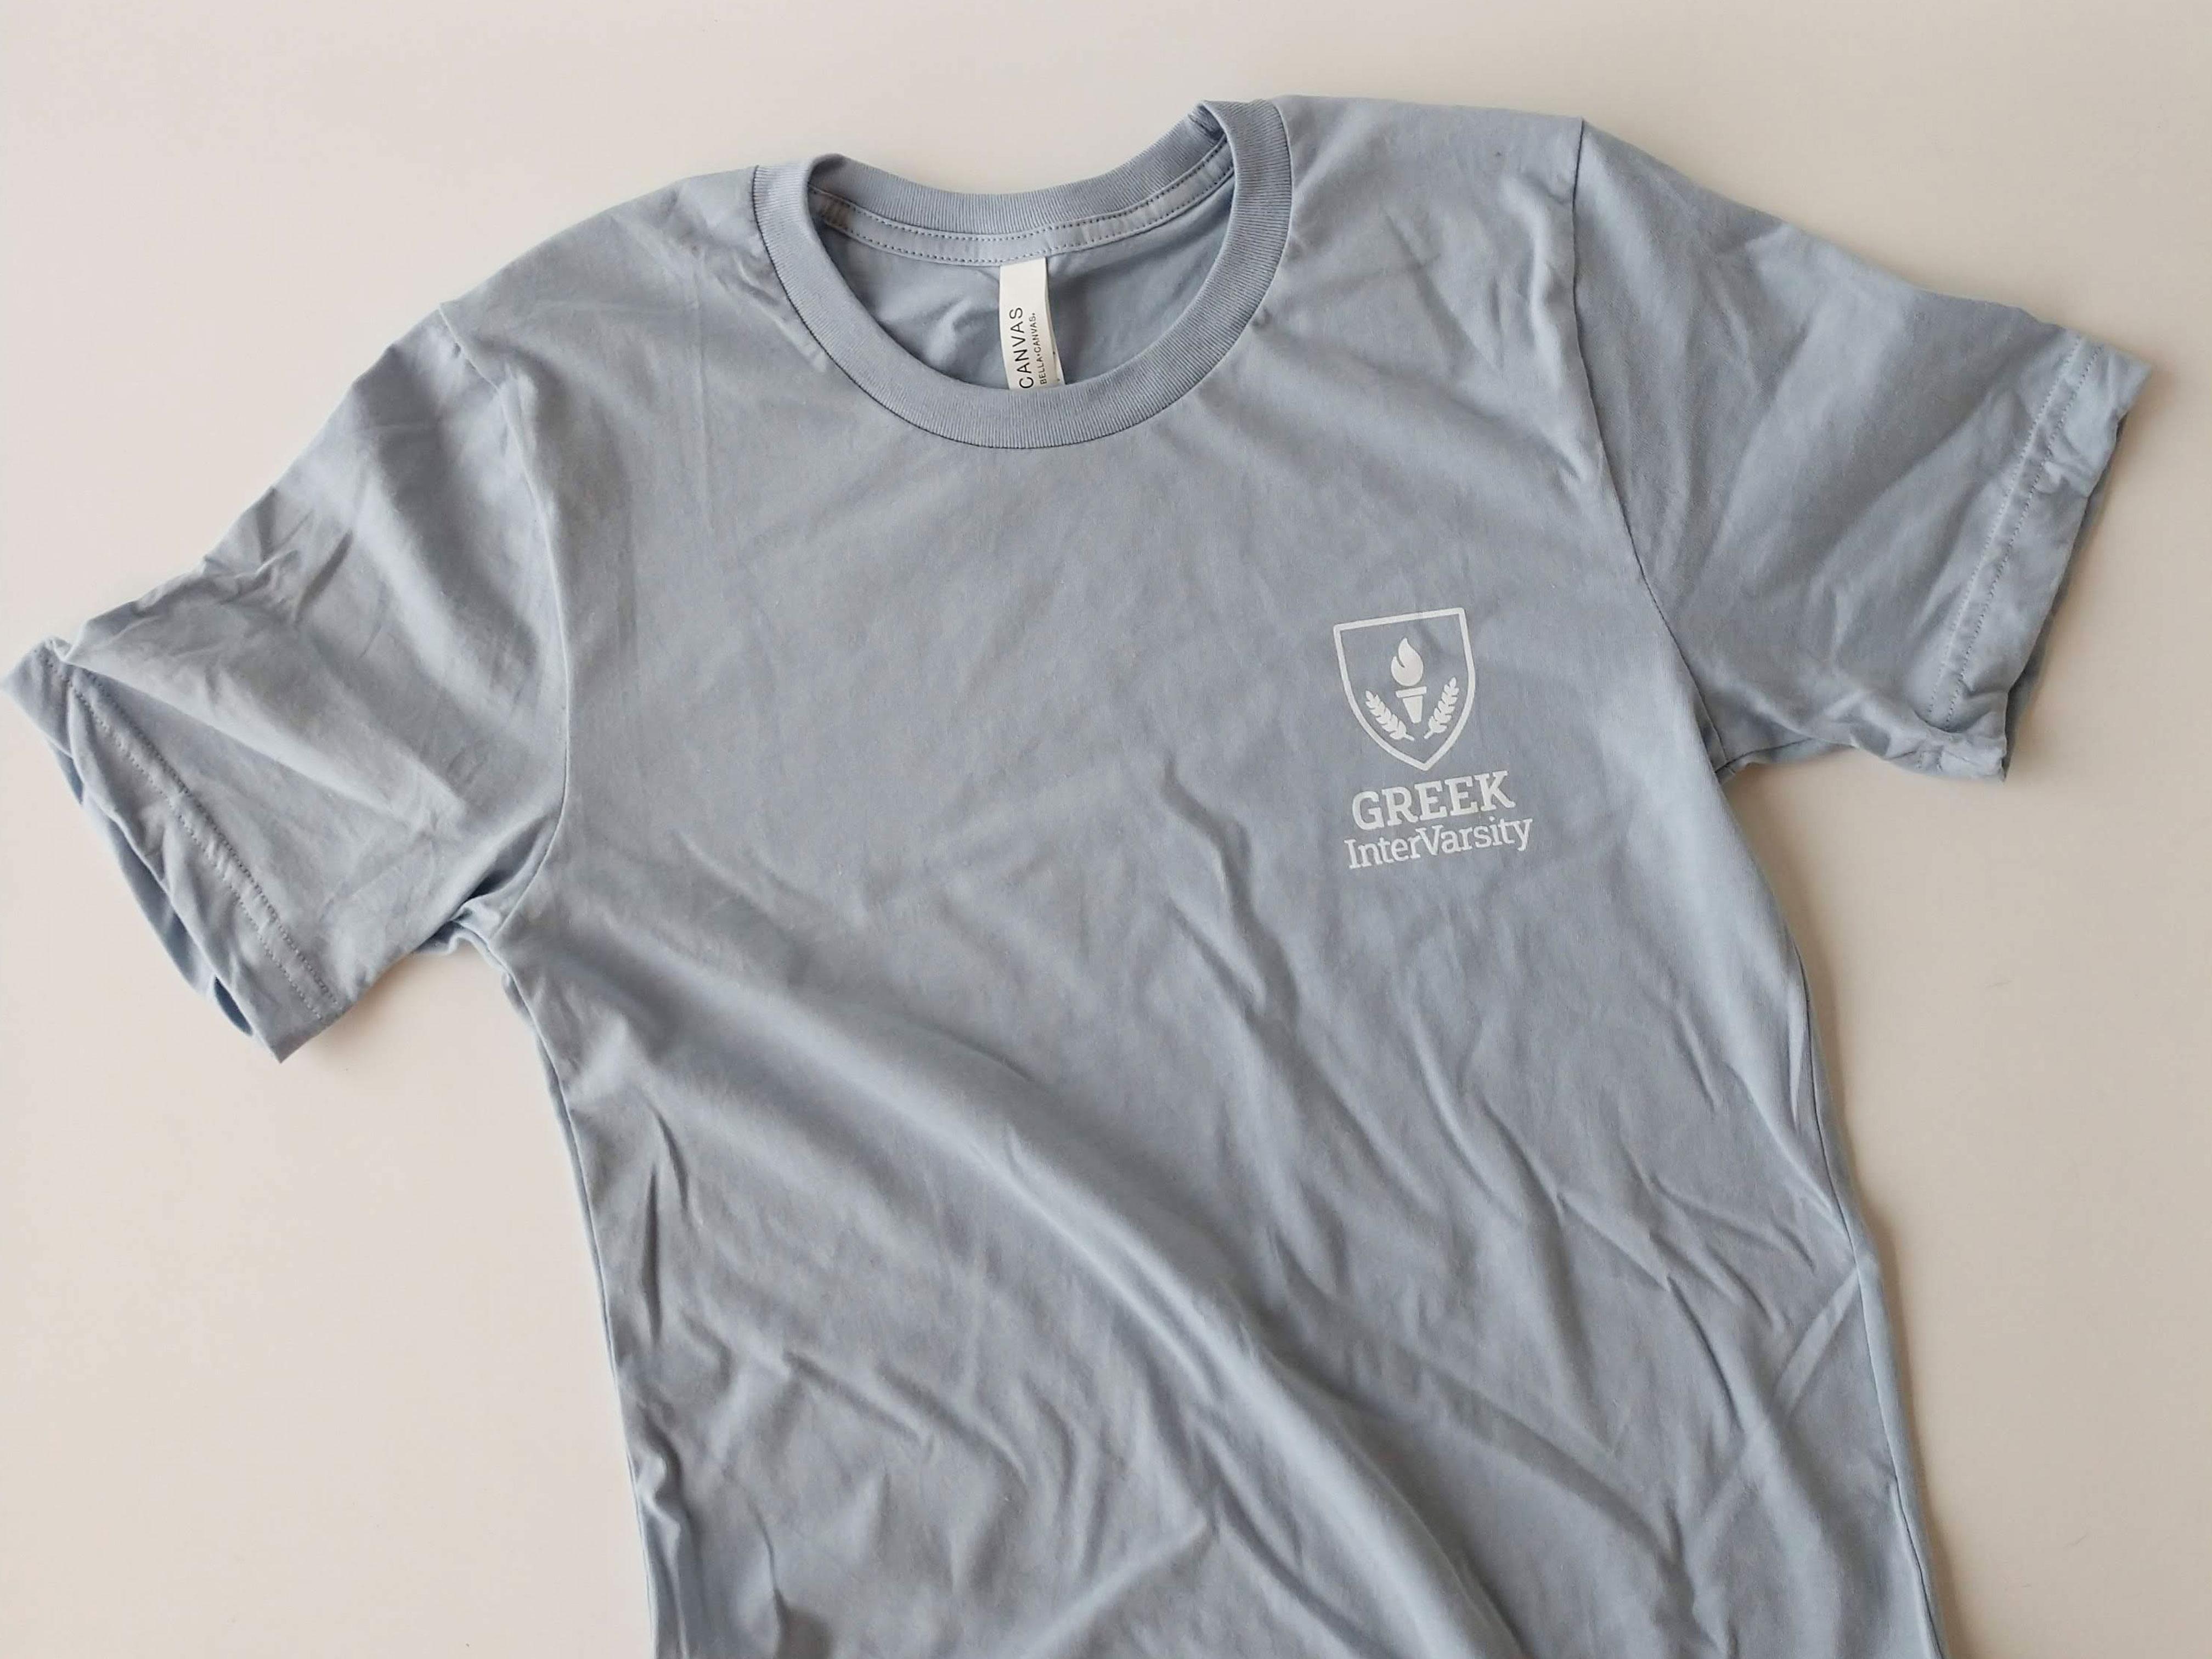 Greek InterVarsity T-Shirt